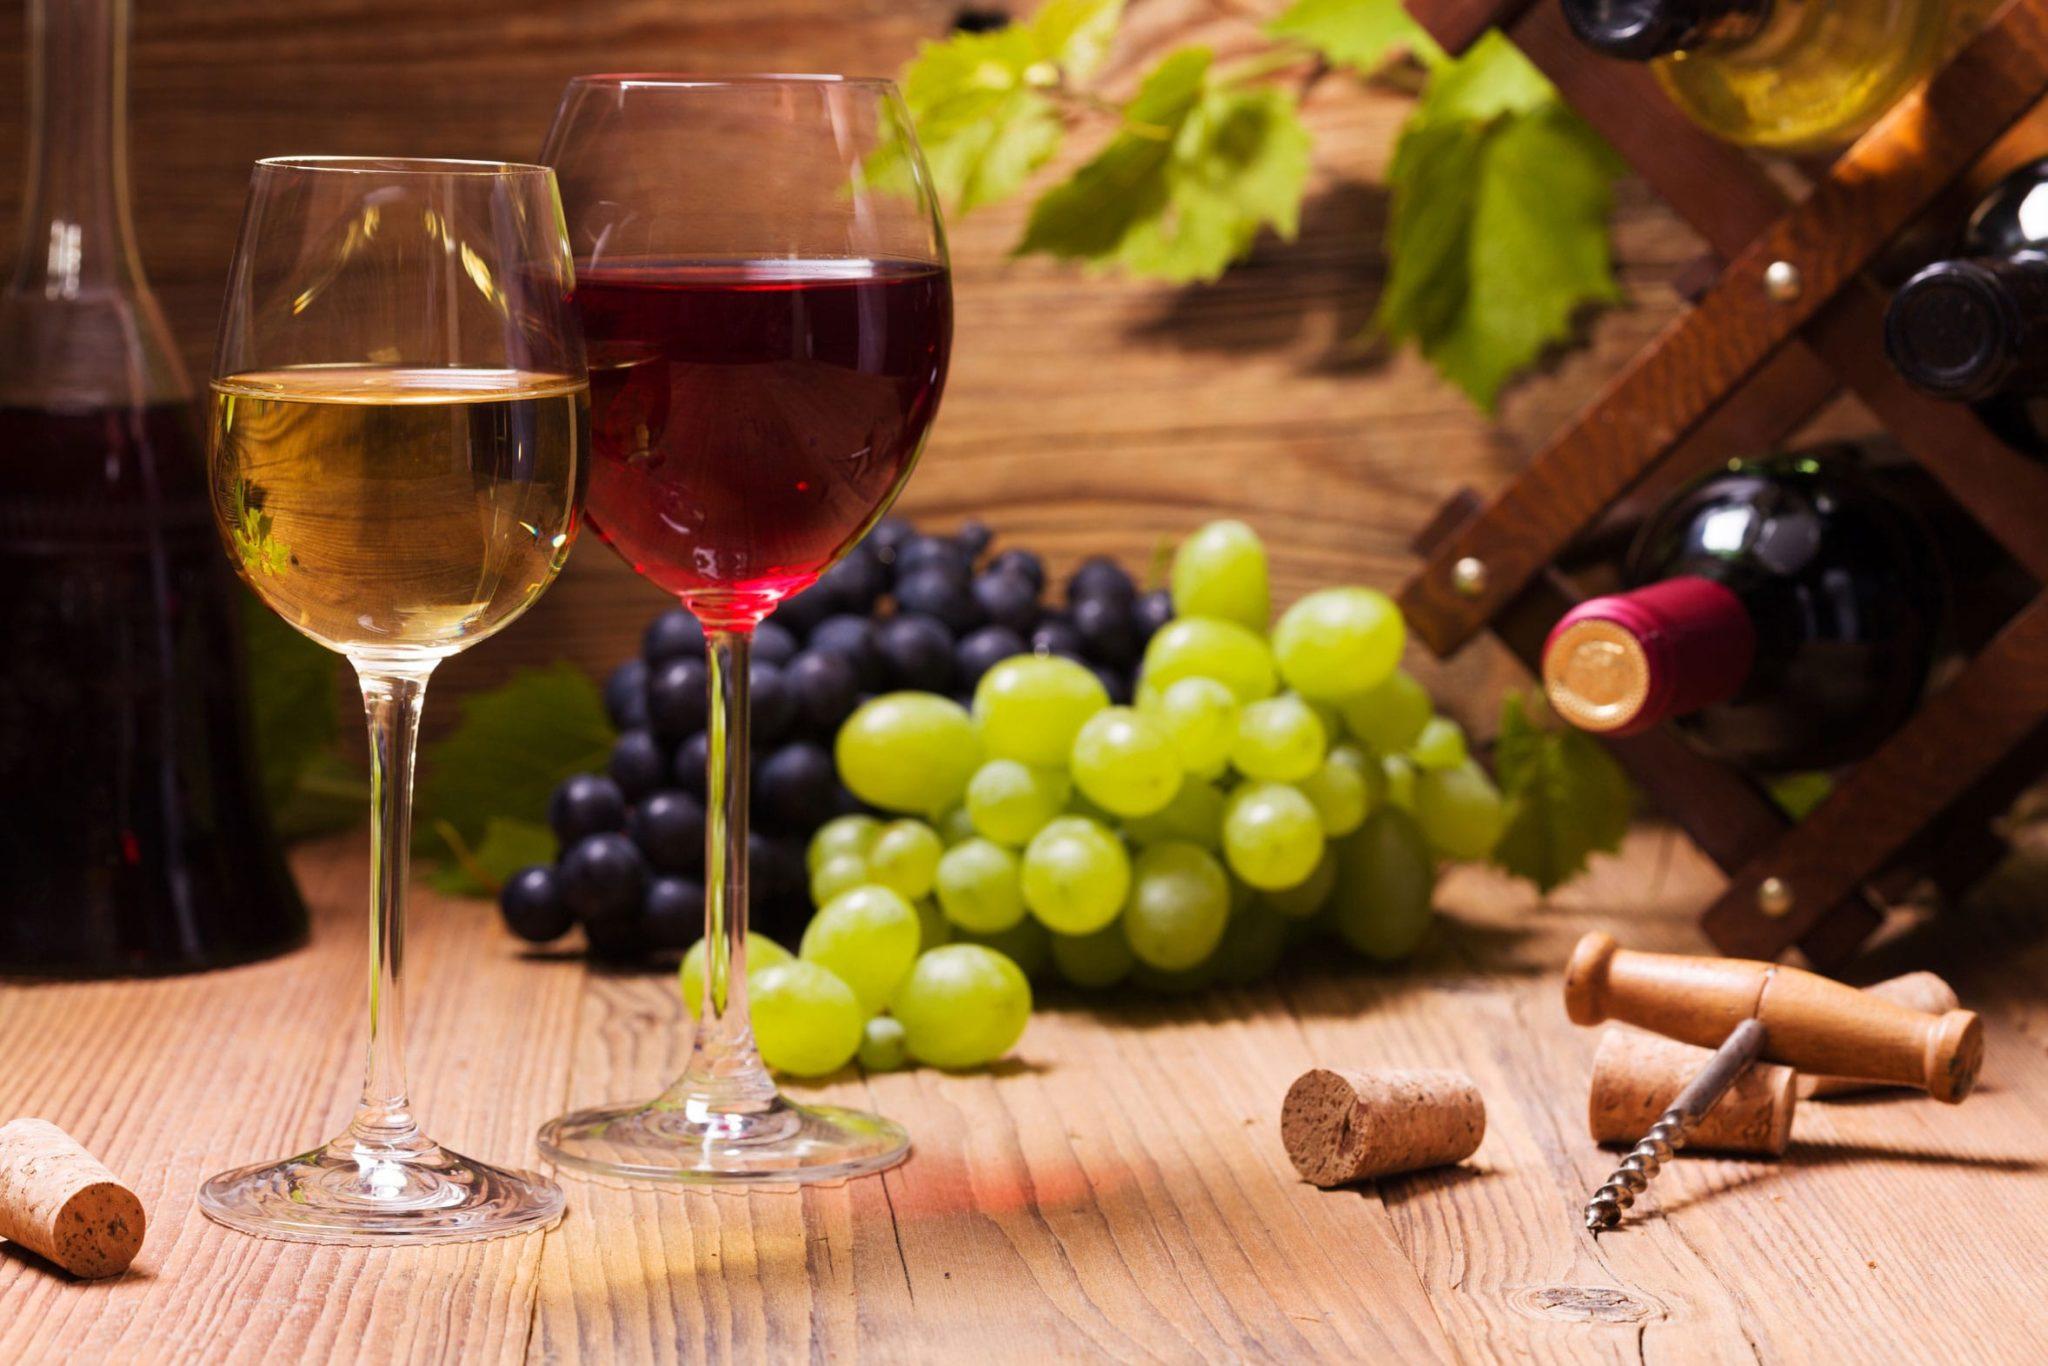 Wi-bev, vino, verona, fiere, beverage, technologies, vin, beverage, technologies, Technologien, Wein